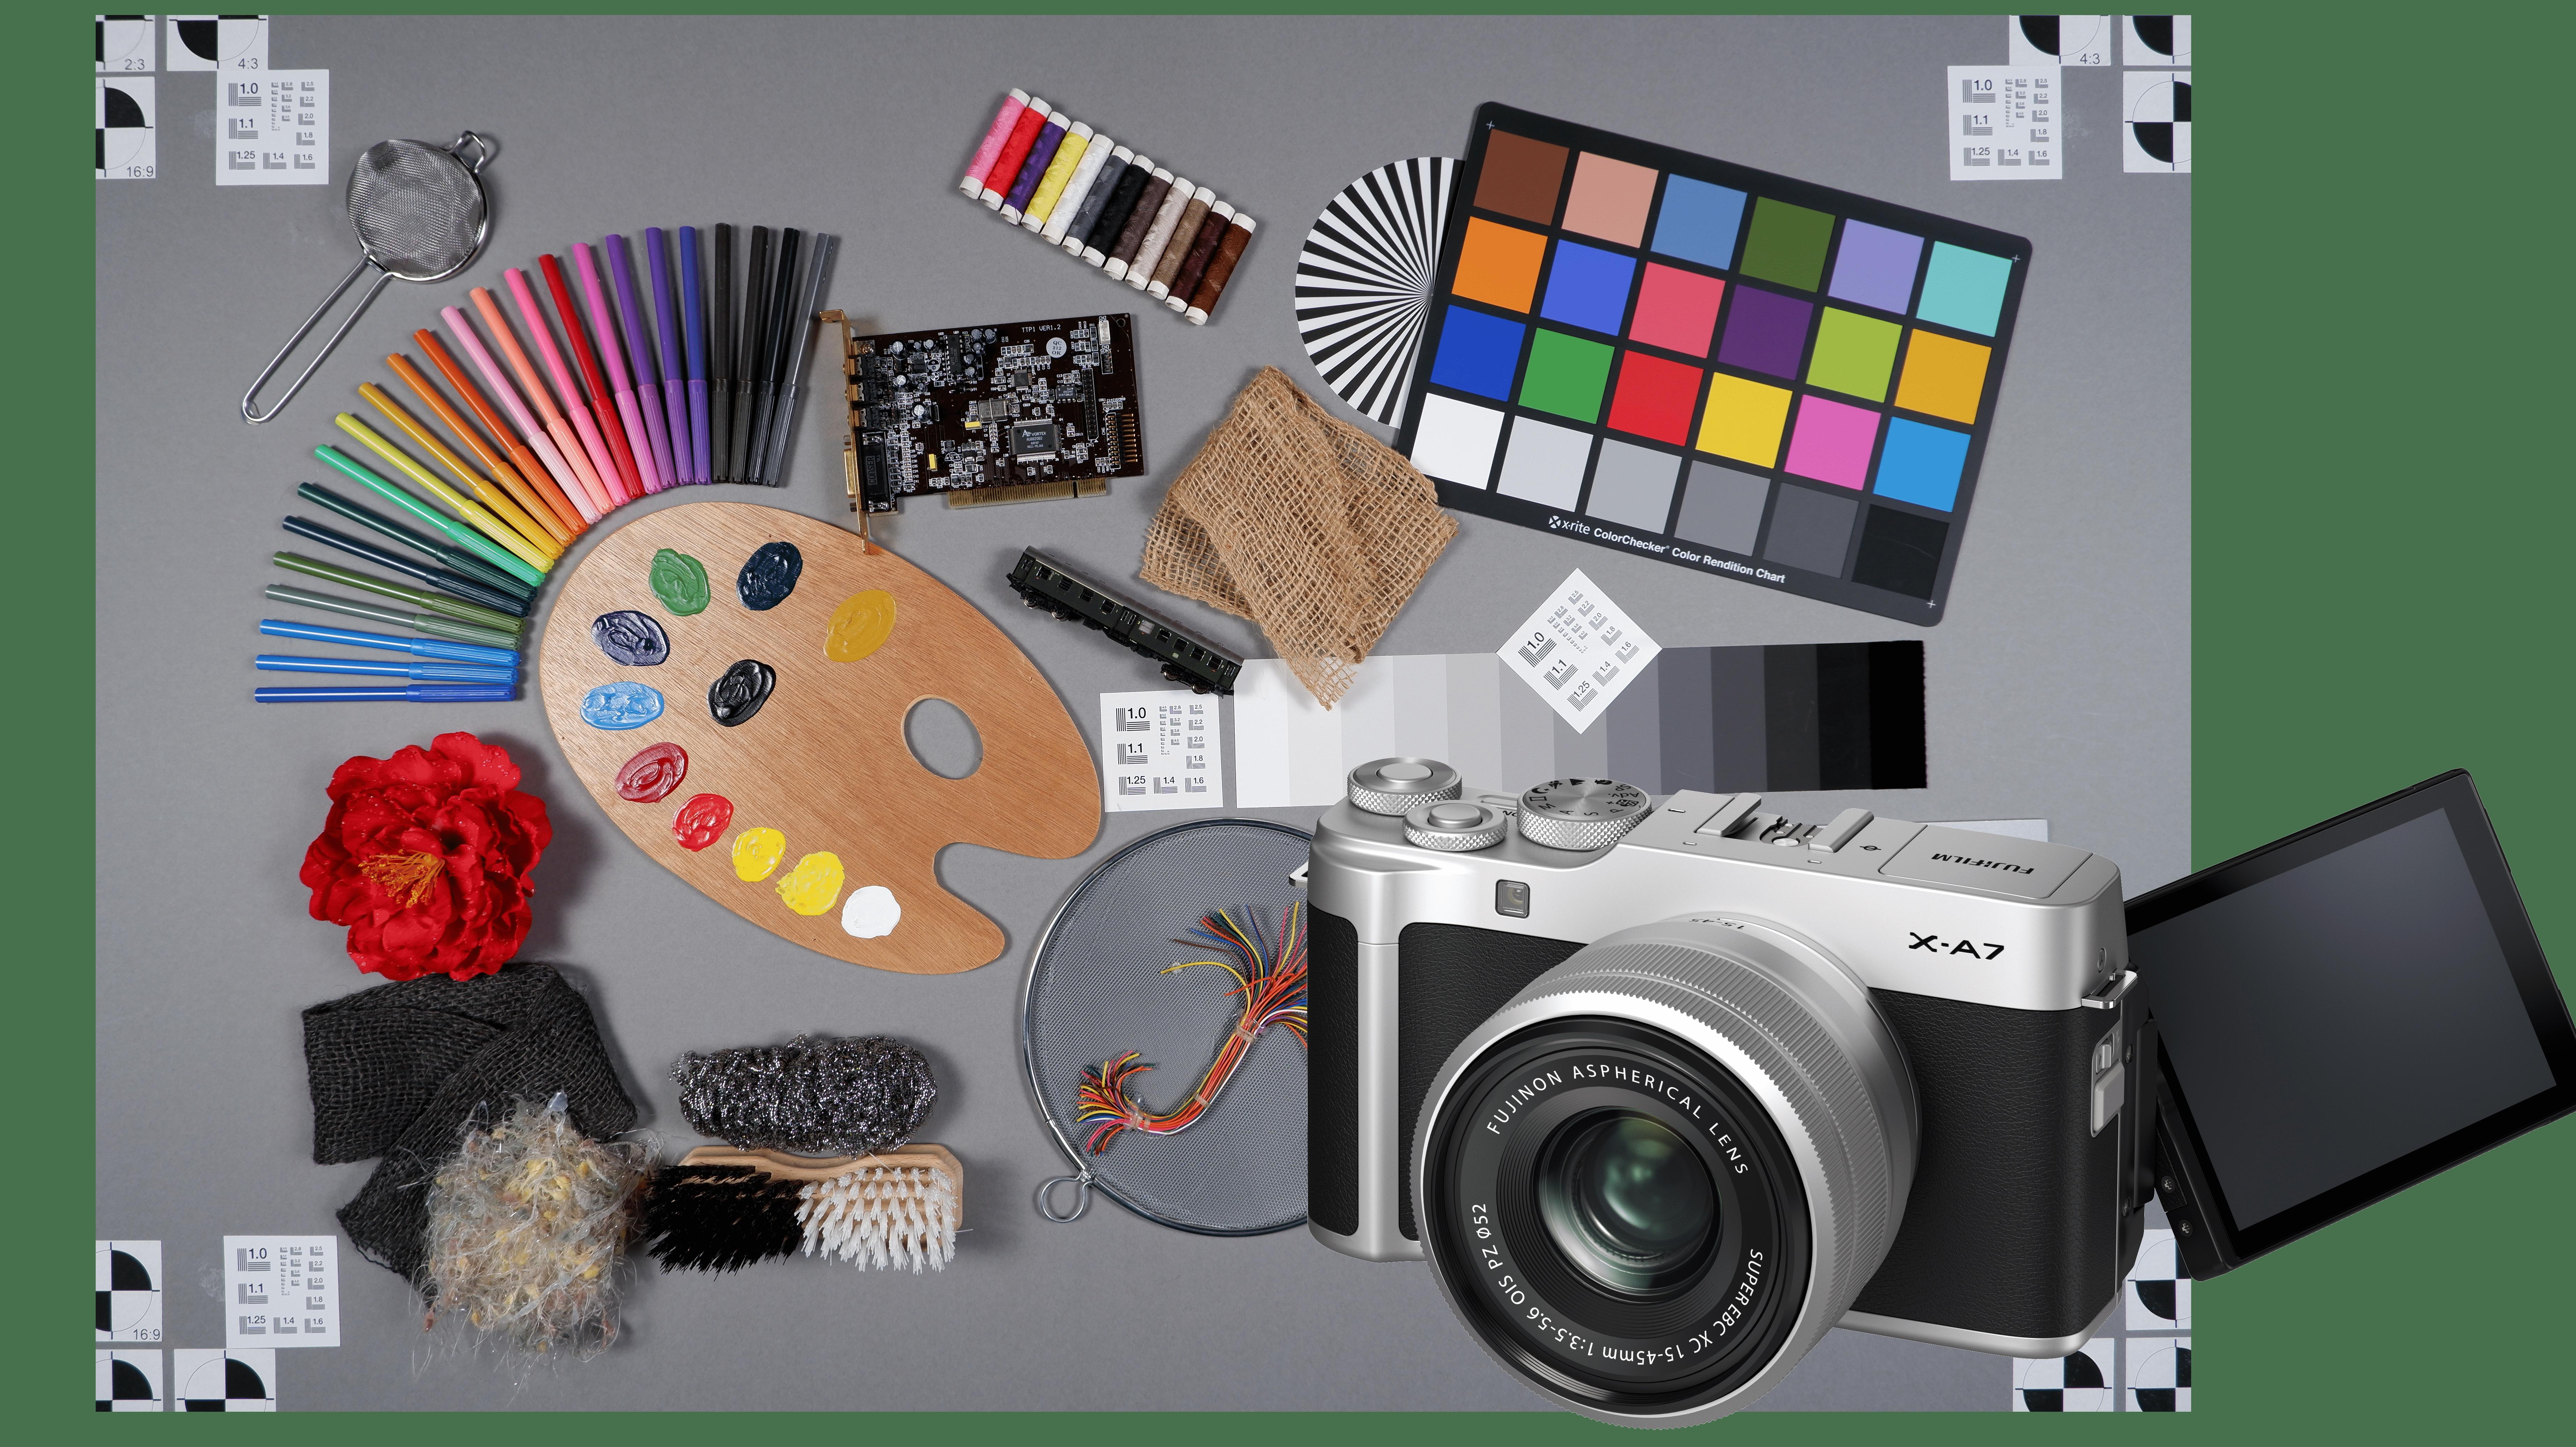 Fujifilm X-A7 im Test -- Einsteiger-Kamera mit extragroßem Display